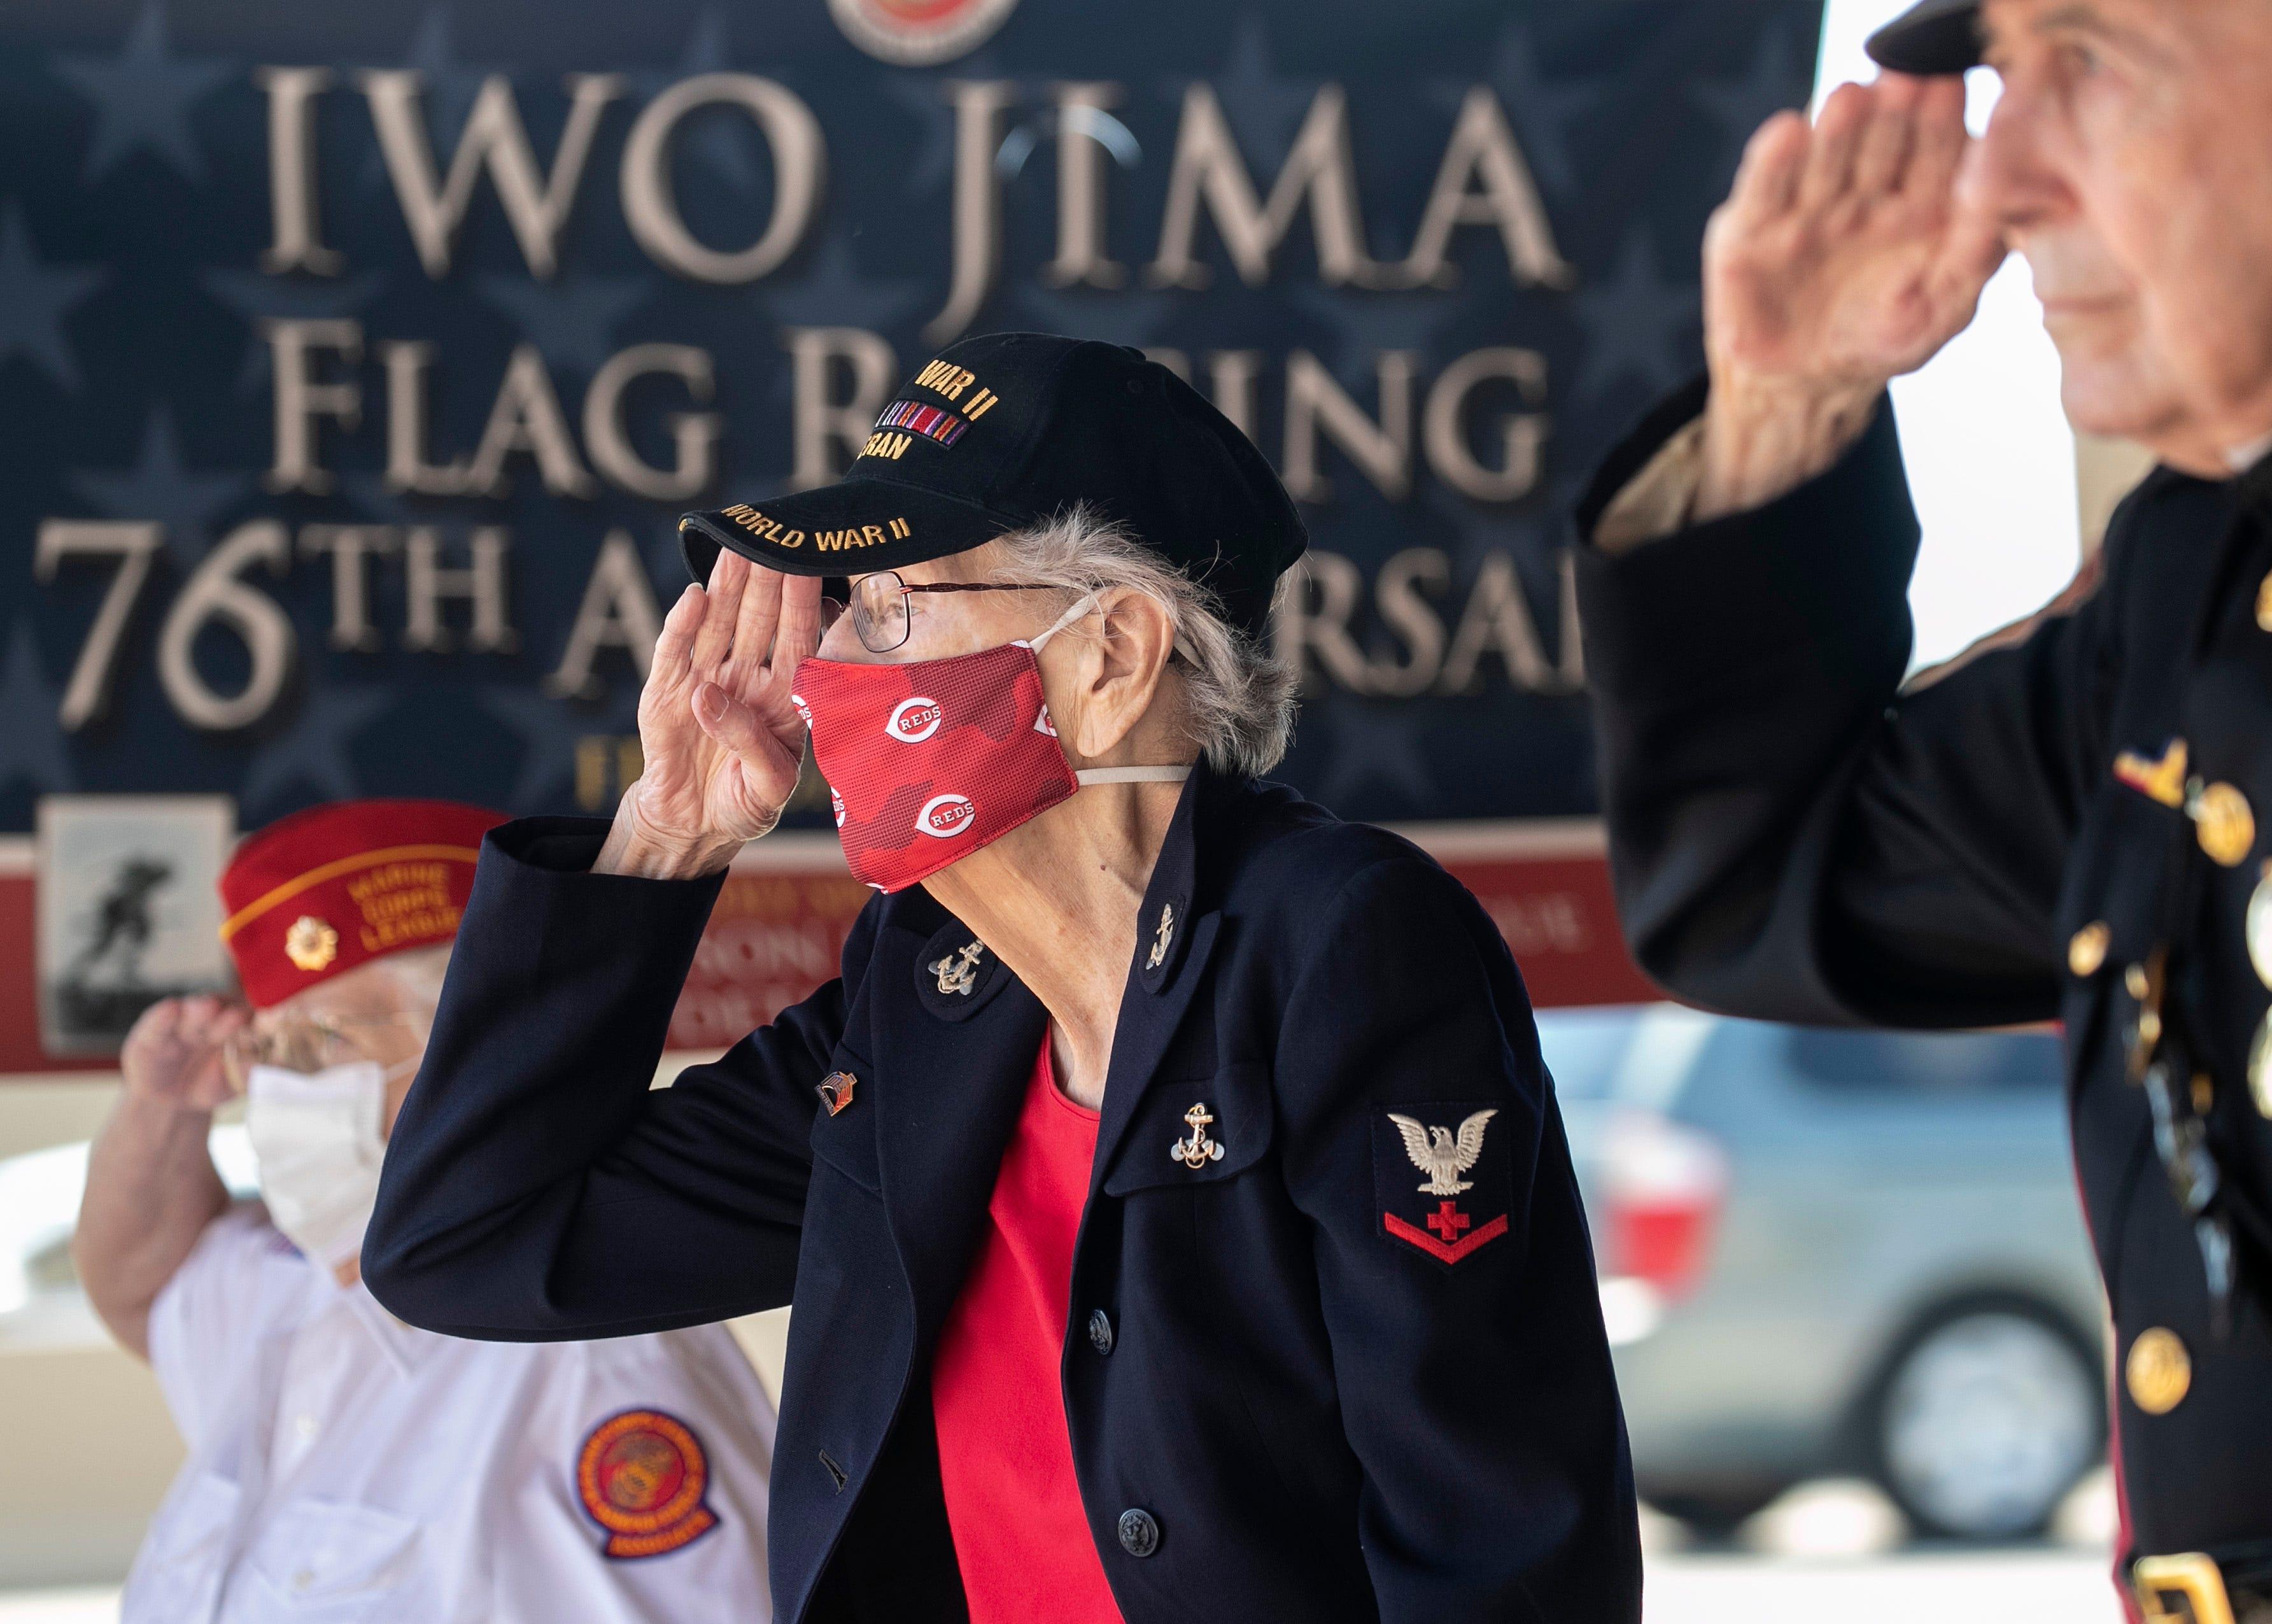 Cape Coral marks 76 years since Iwo Jima flag-raising with fewer living World War II vets 2